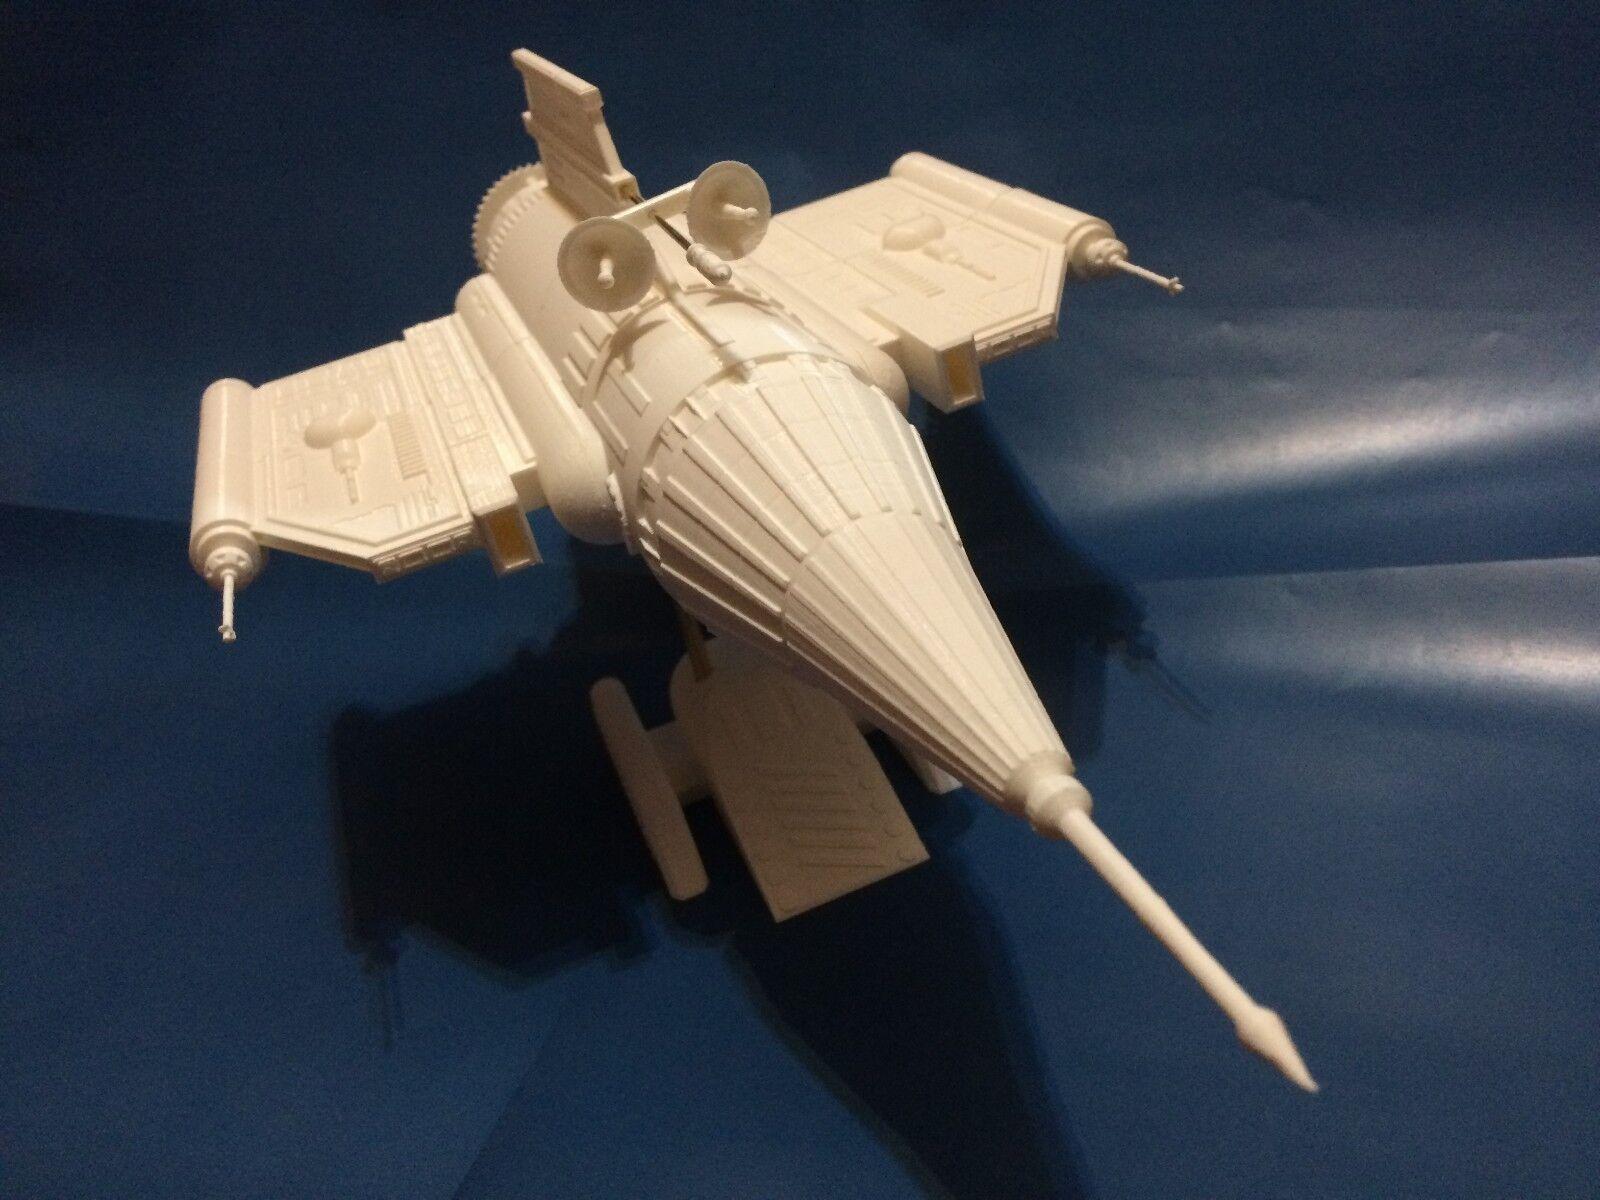 Blakes 7 Federation Pursuit Ship - 28 inch Model Kit